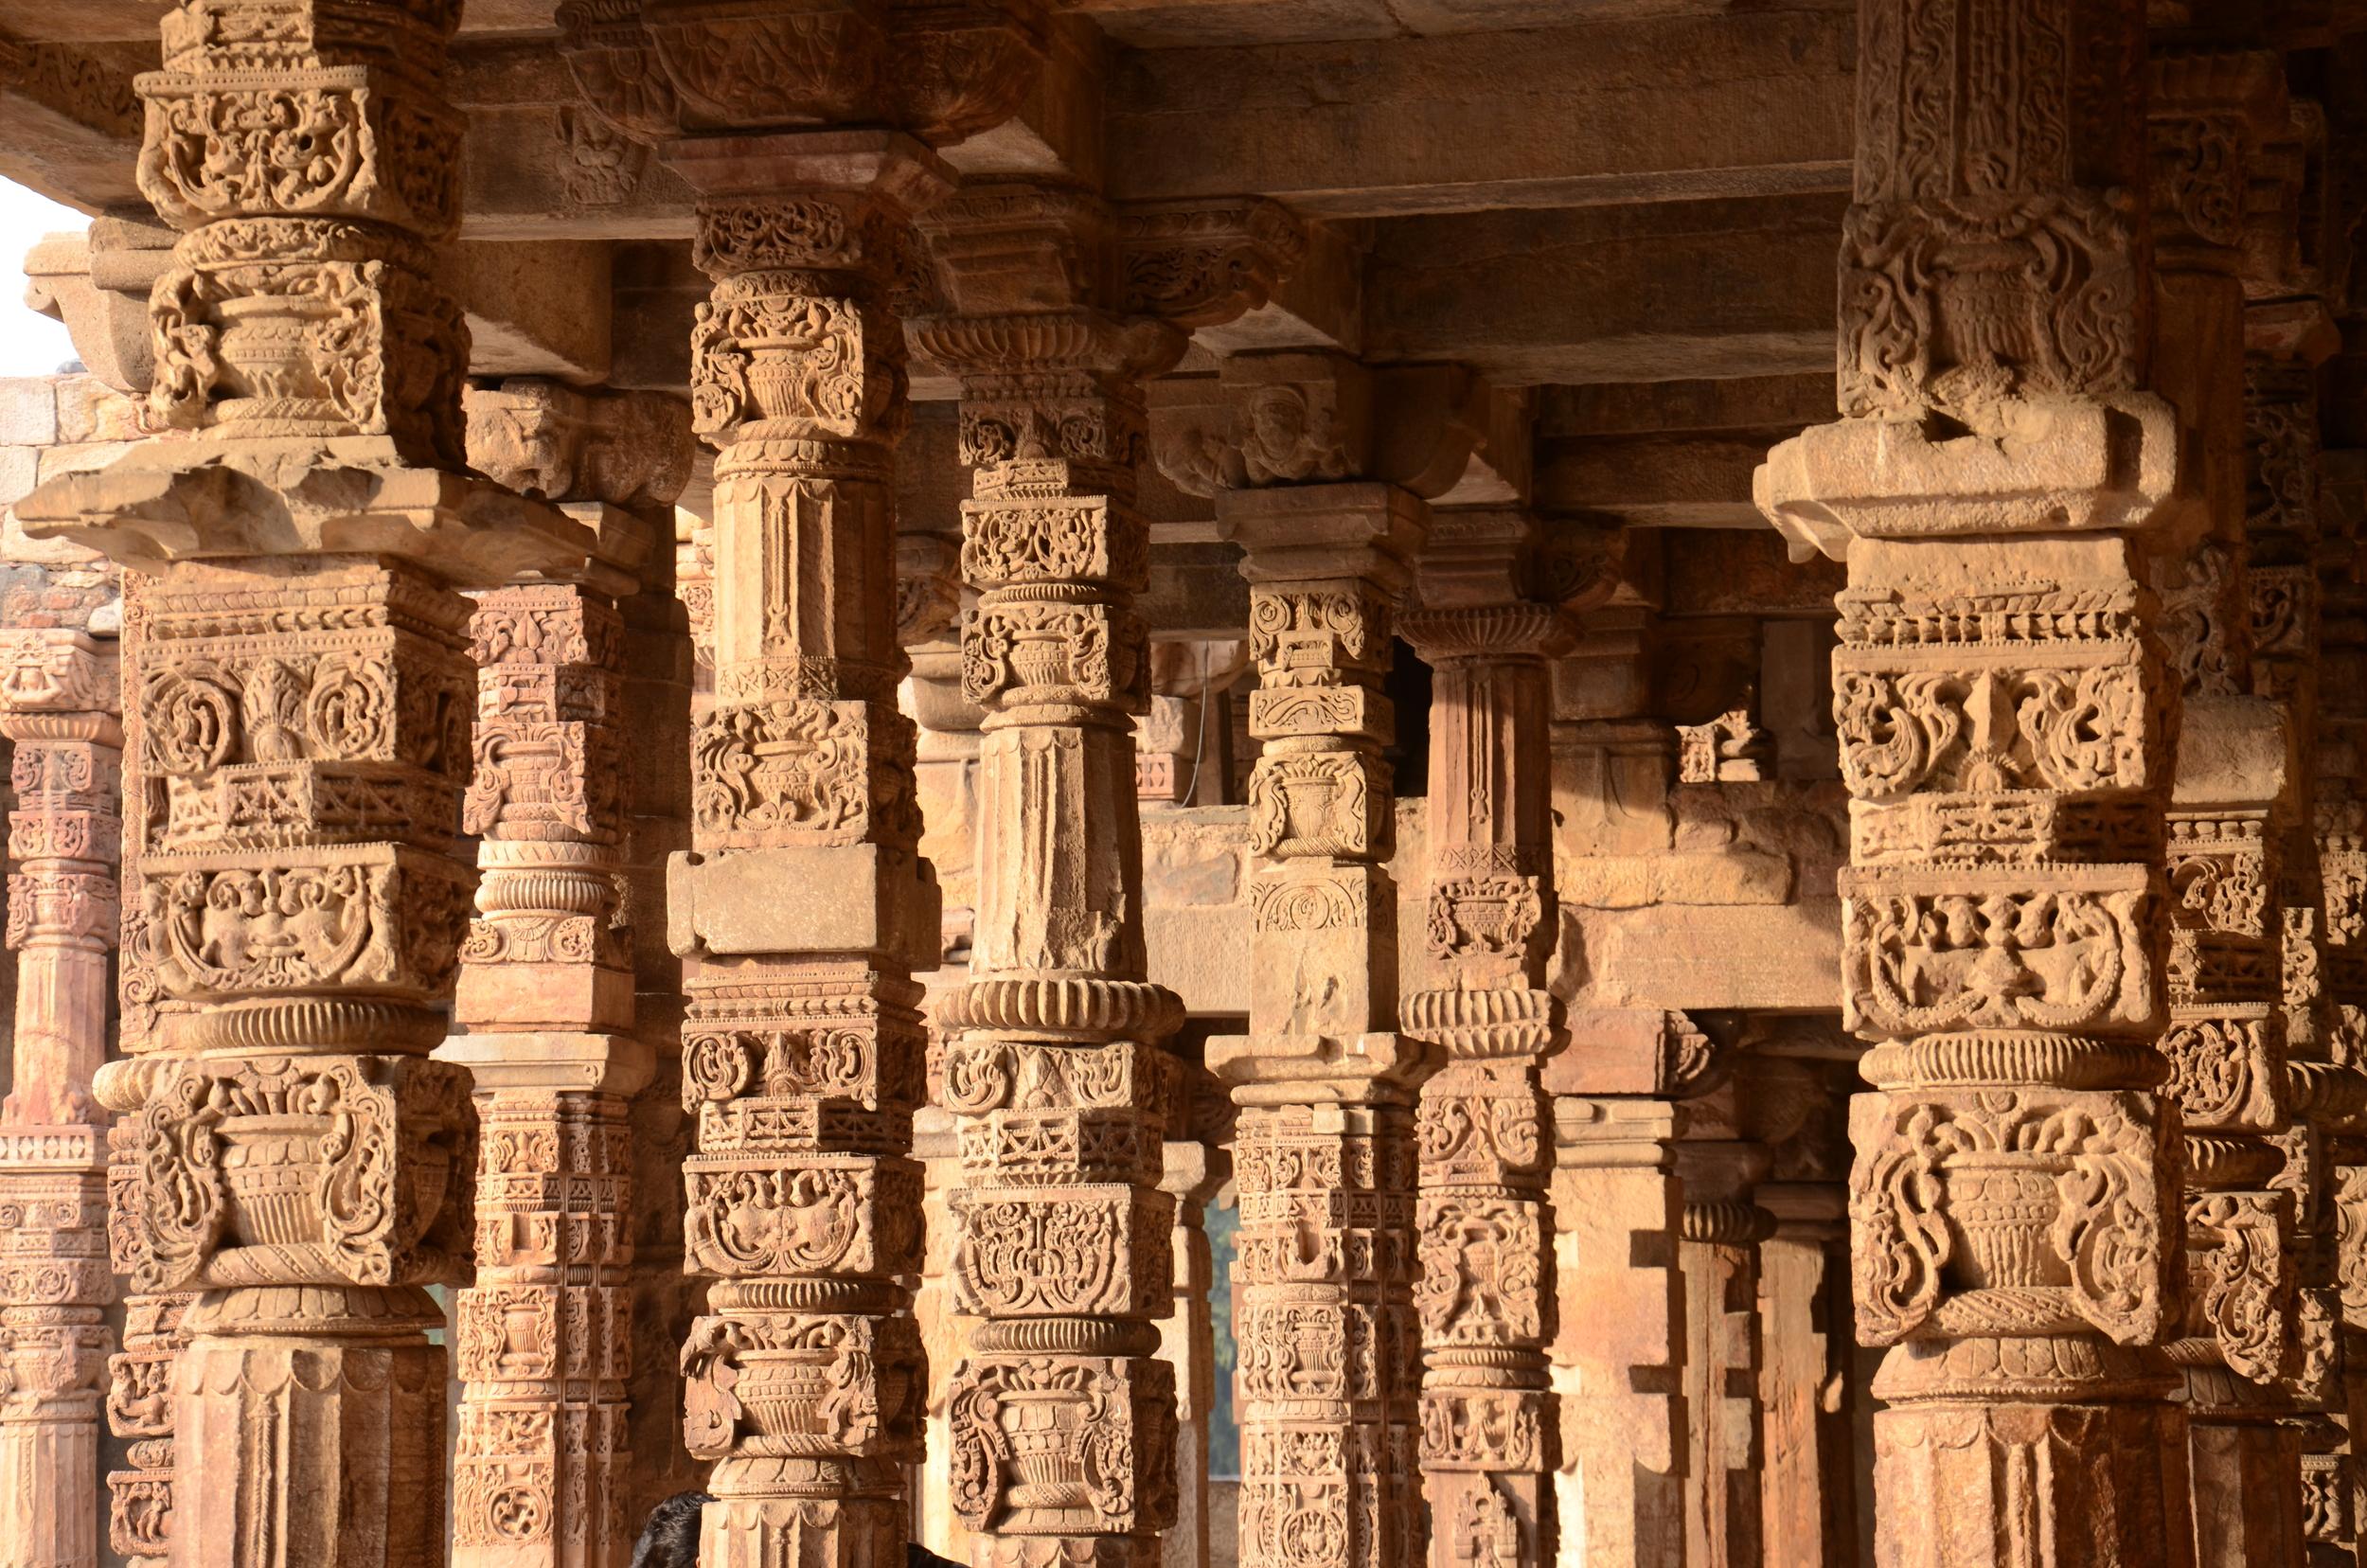 Columns in the Qutb Complex